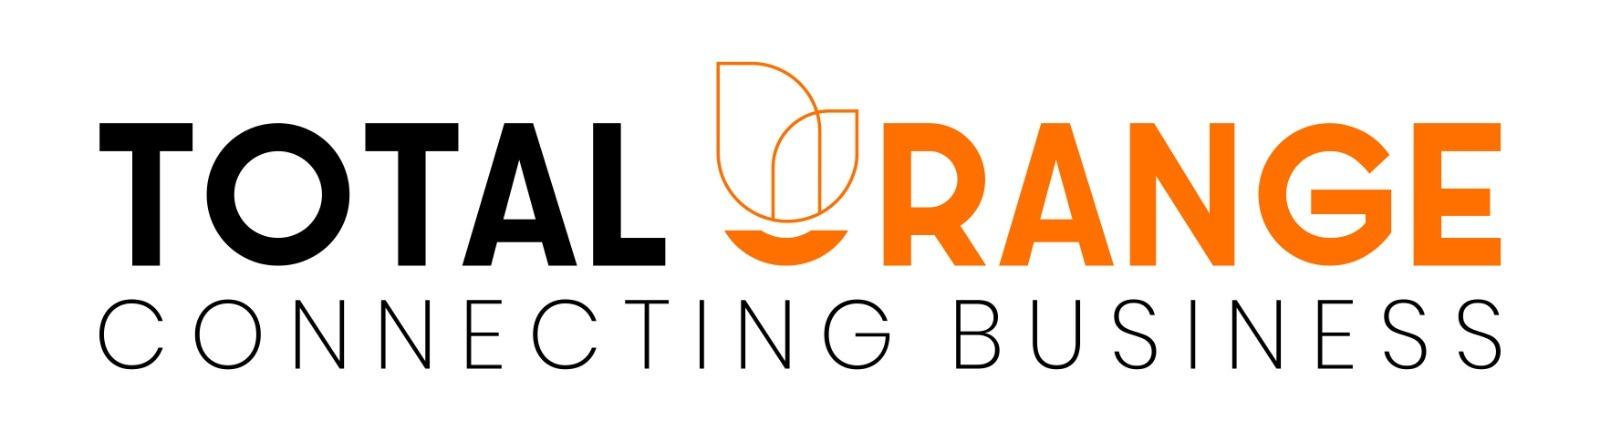 Total Orange Business